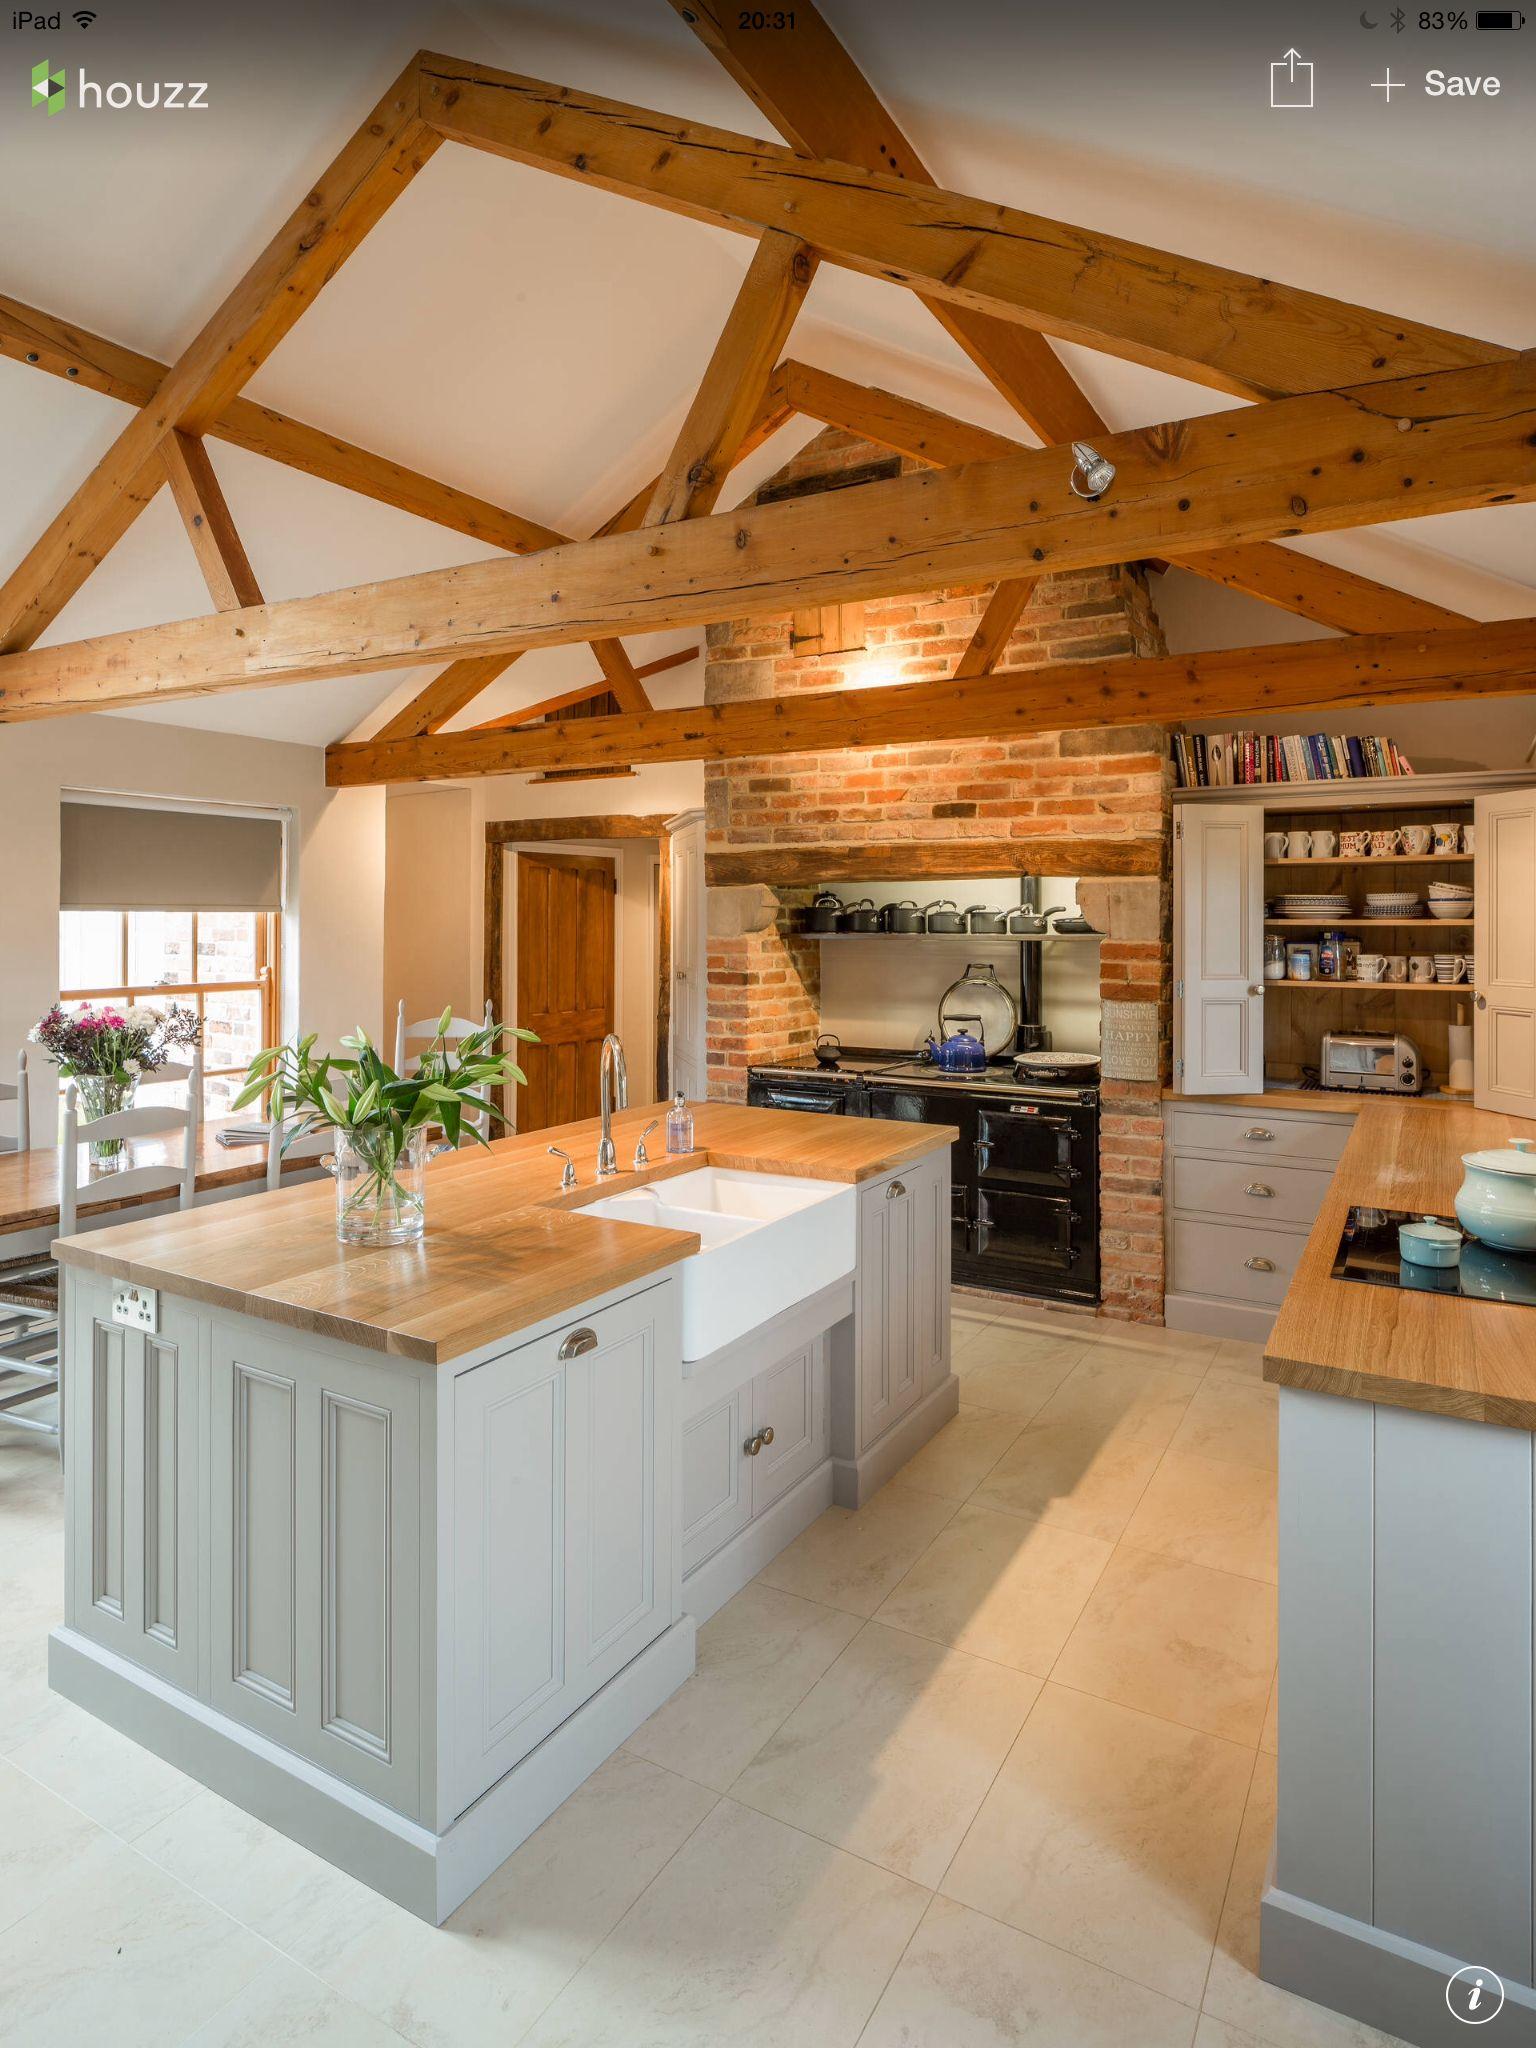 Kitchen kitchen ideas pinterest house home and kitchen